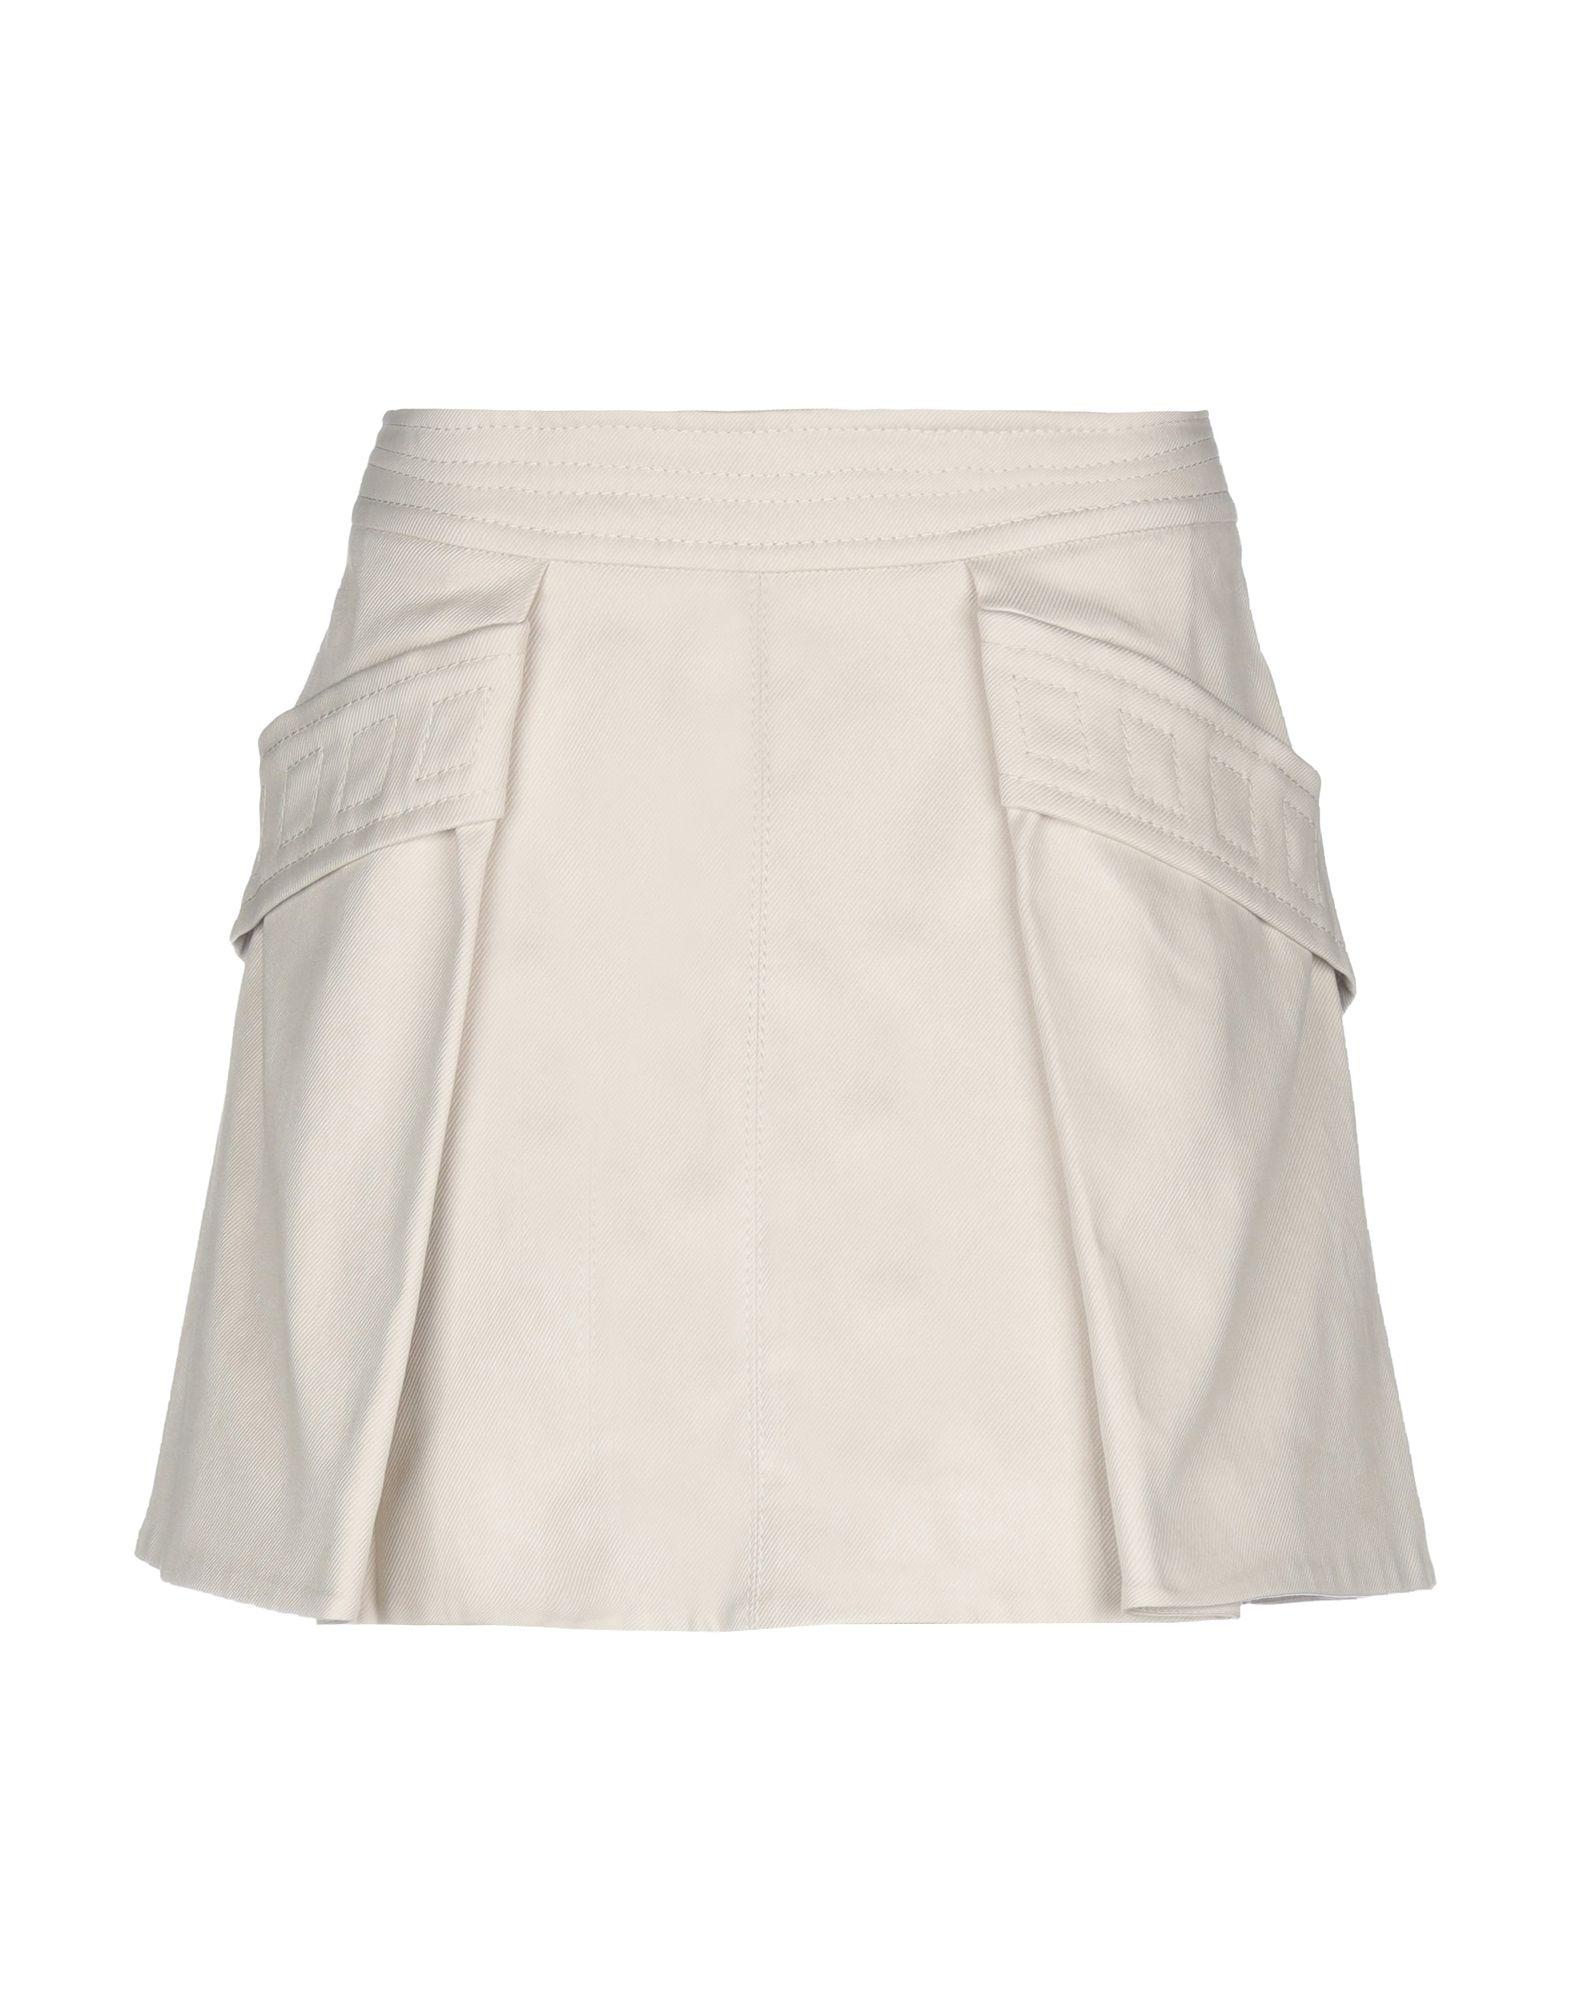 DOROTHEE SCHUMACHER Мини-юбка dorothee schumacher юбка длиной 3 4